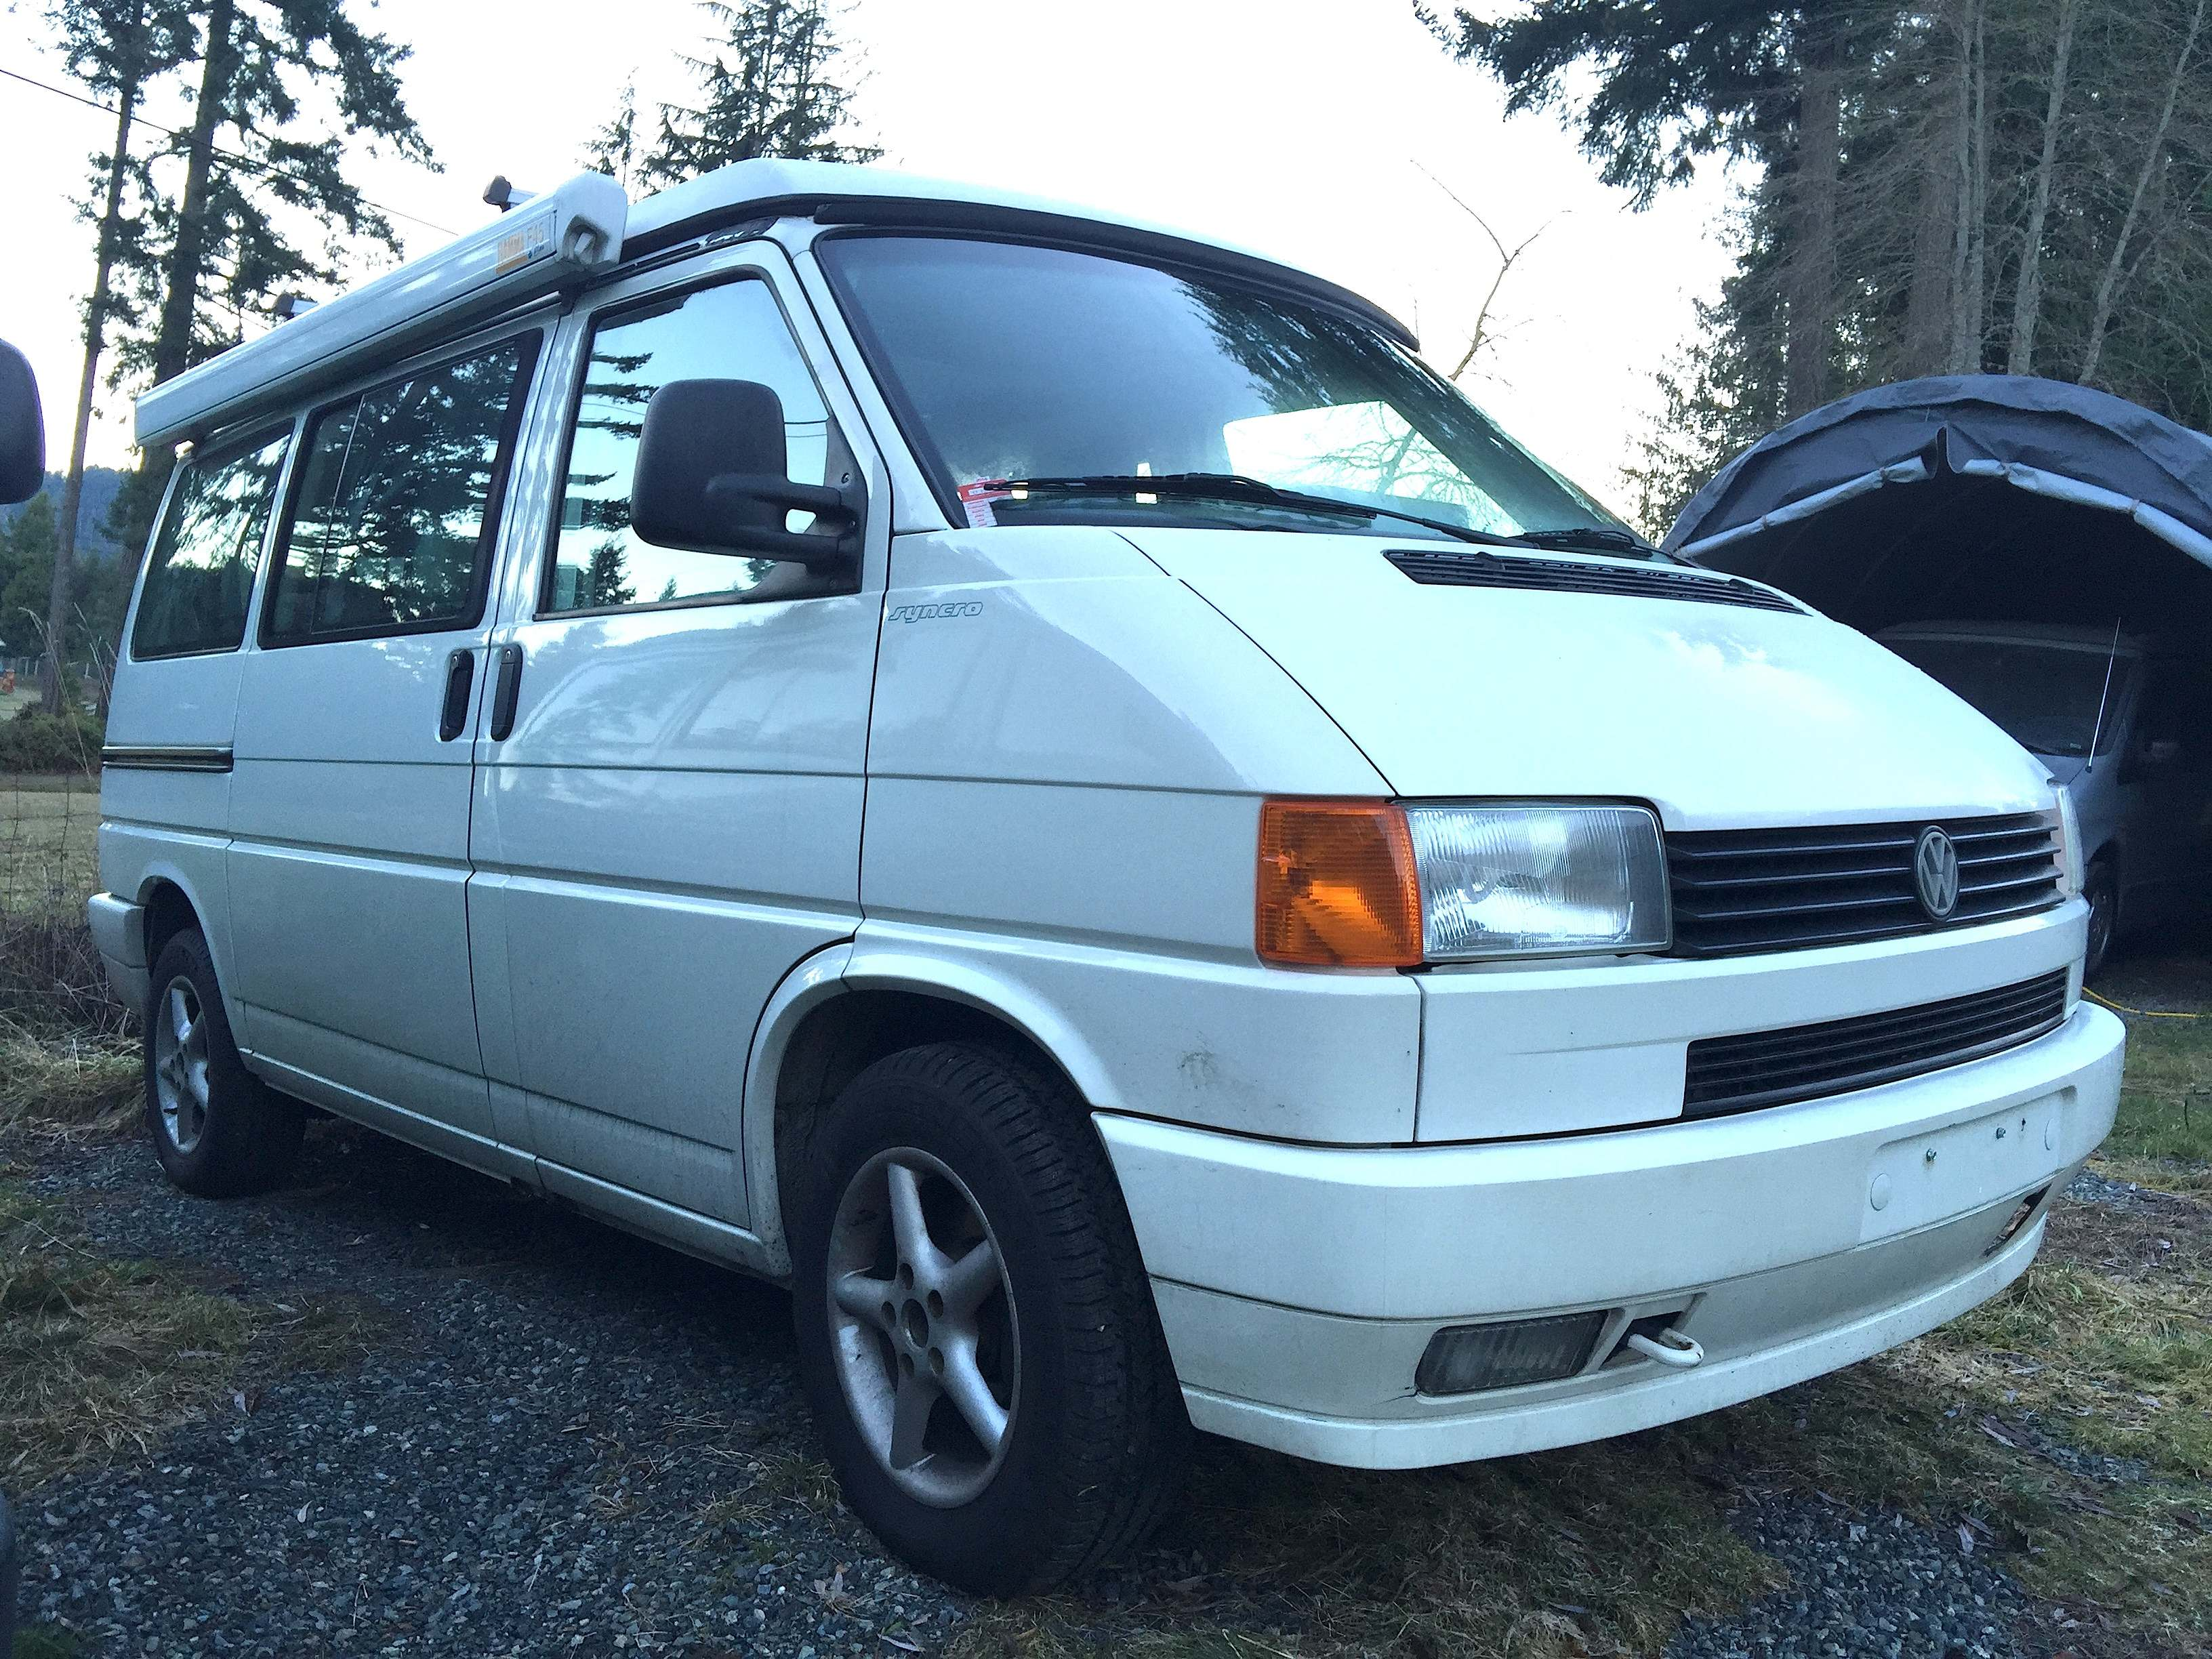 1996 VW Syncro 4x4 Eurovan Westfalia camper